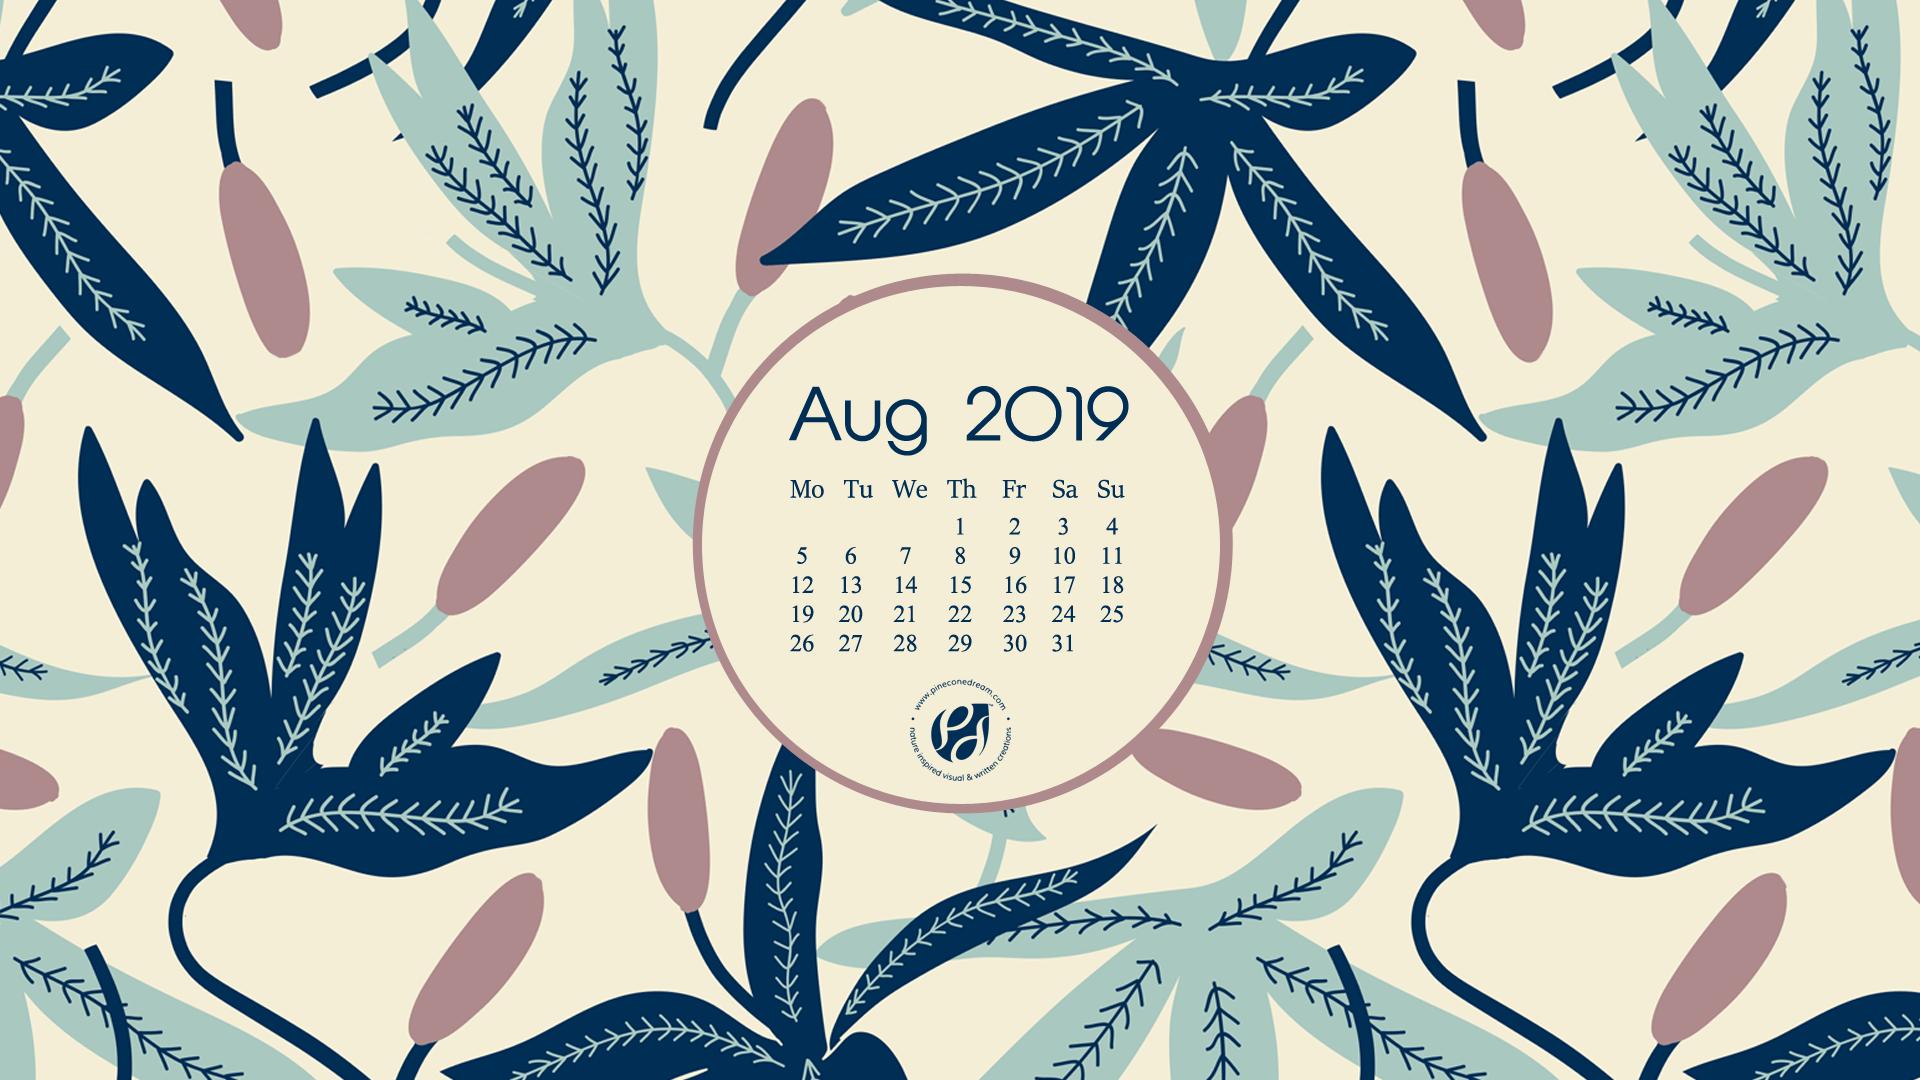 August 2019 Free Calendar Wallpapers Printable Planner